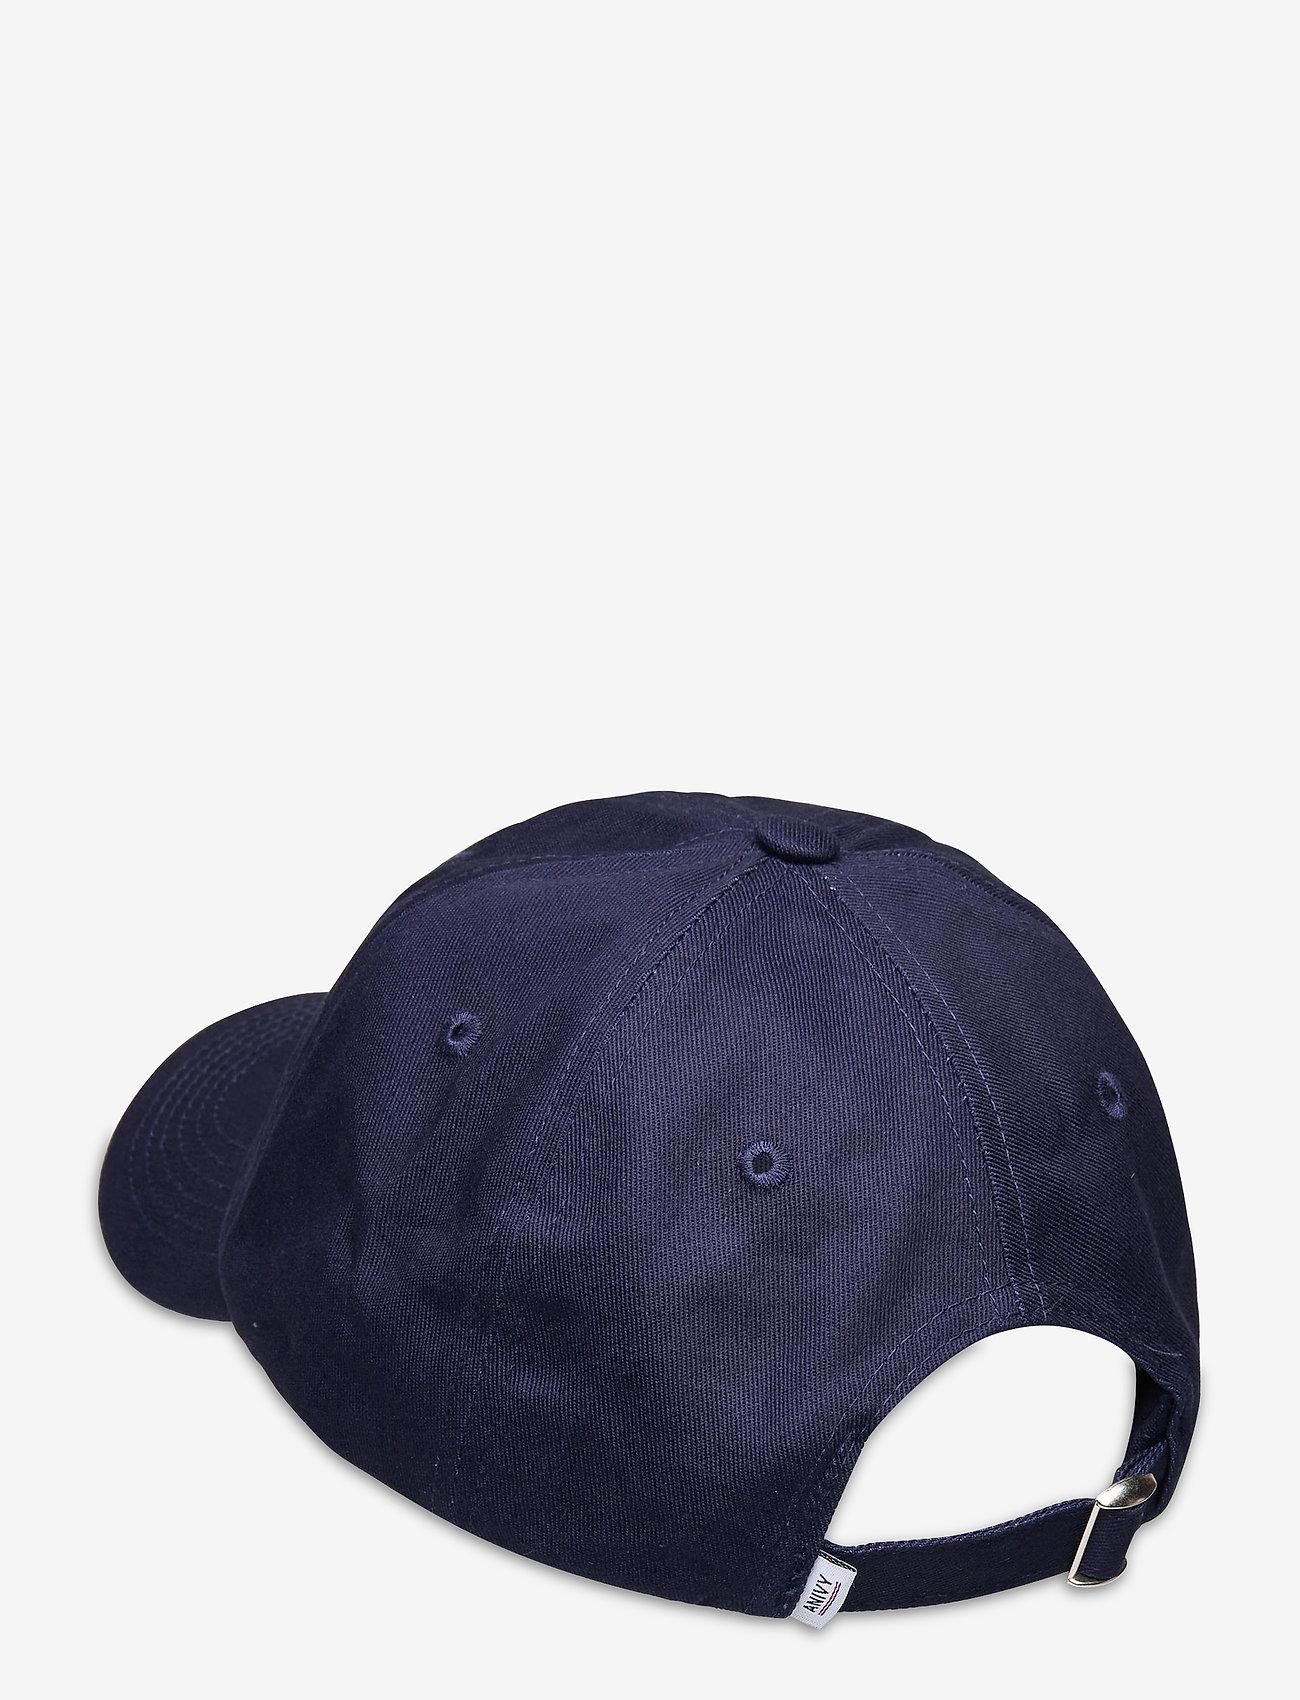 An Ivy - Navy Shopper Cap - kasketter - white/navy/brown - 1